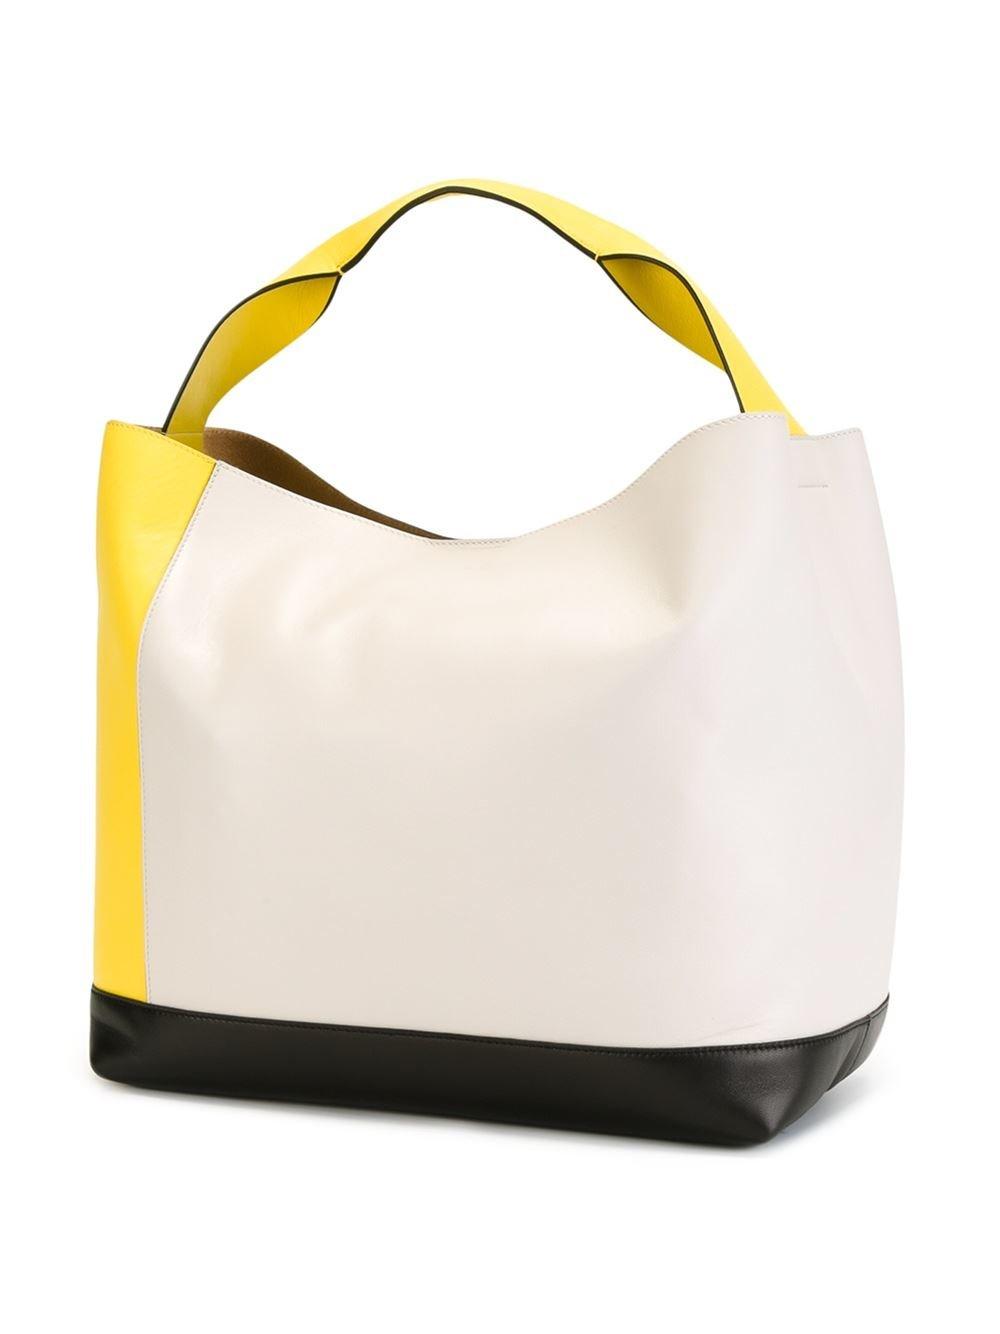 Marni Pod Color-Blocked Leather Tote Bag in Yellow/Orange (White)